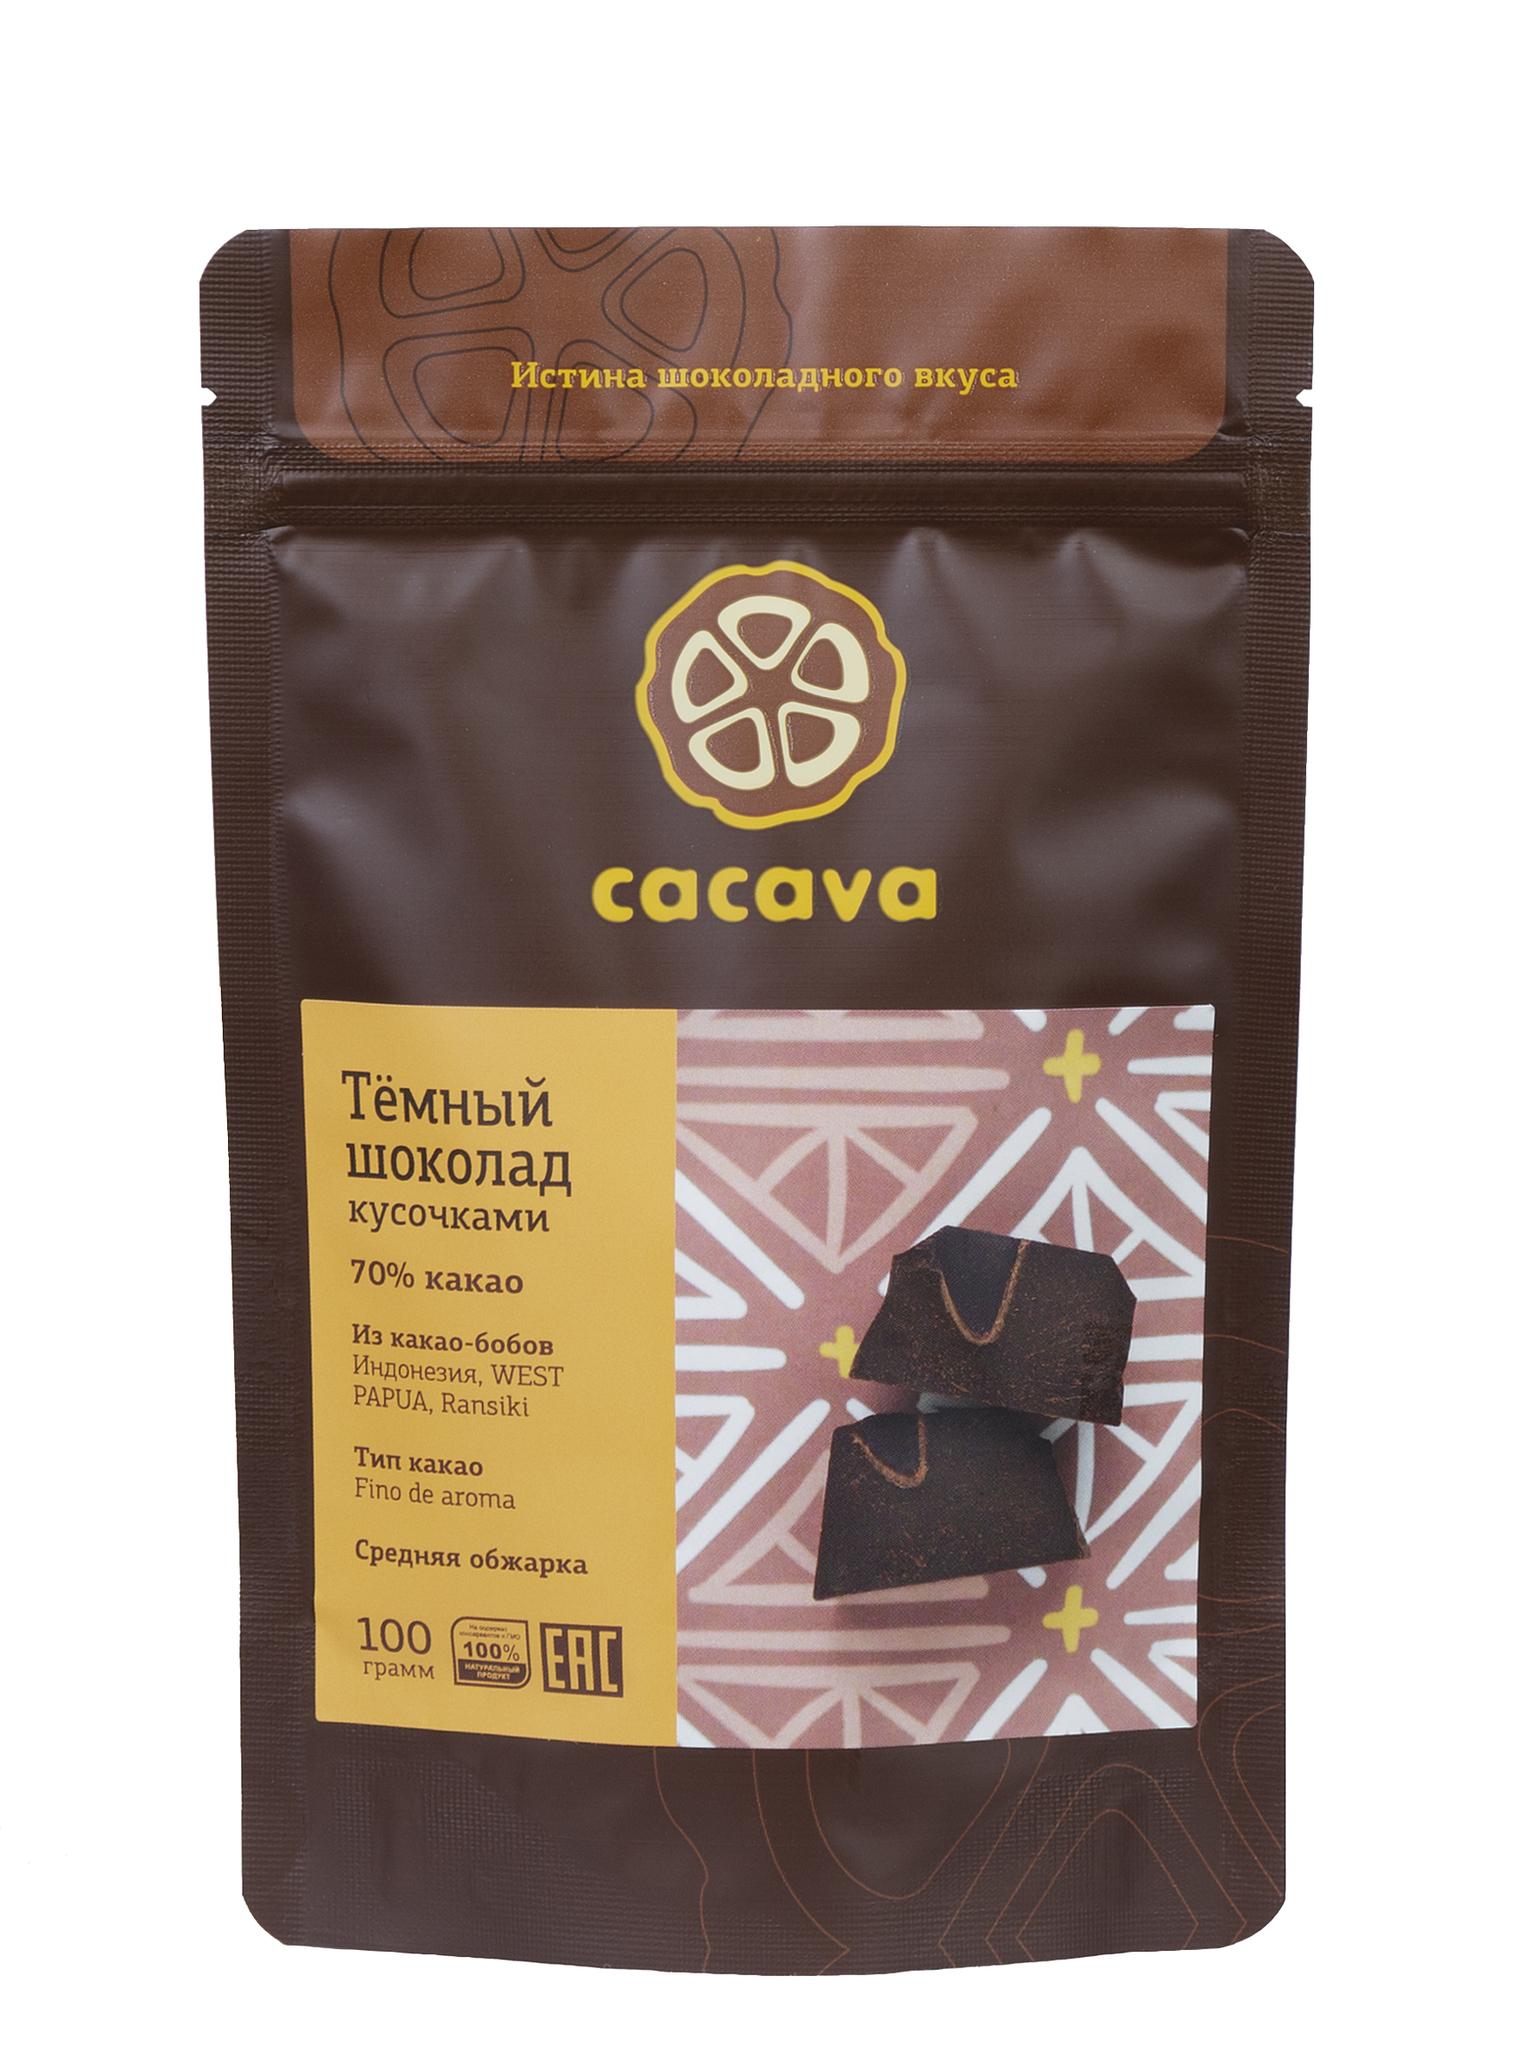 Тёмный шоколад 70 % какао (Индонезия, WEST PAPUA, Ransiki), упаковка 100 грамм